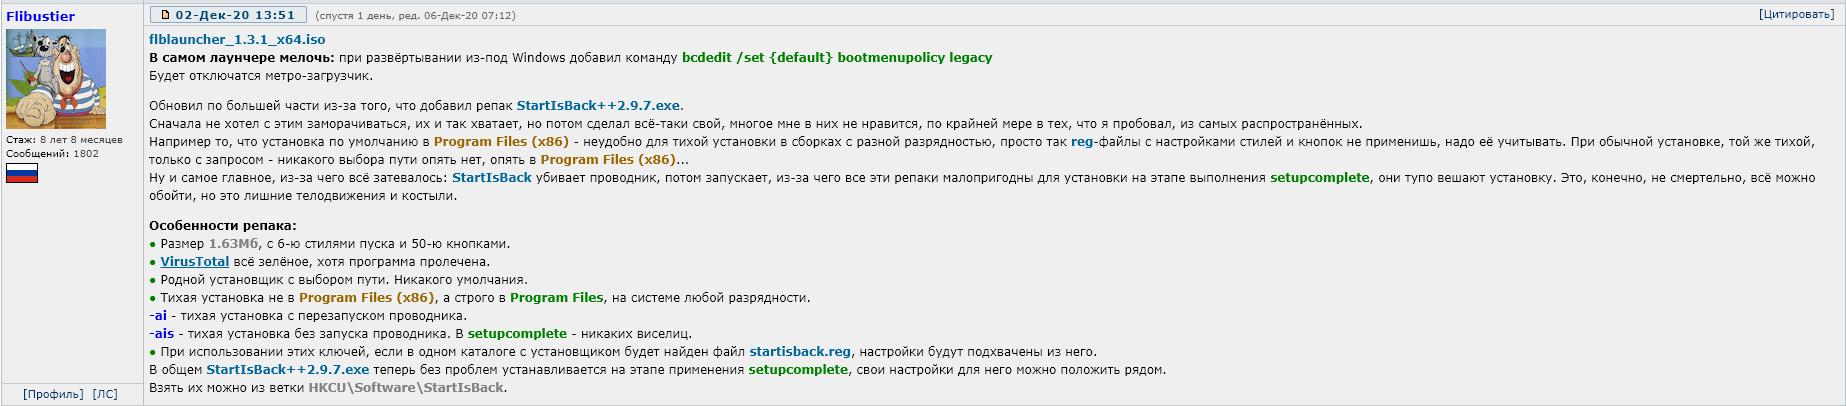 https://i4.imageban.ru/out/2020/12/09/1b75162996b51da01cab14a7784938b4.png